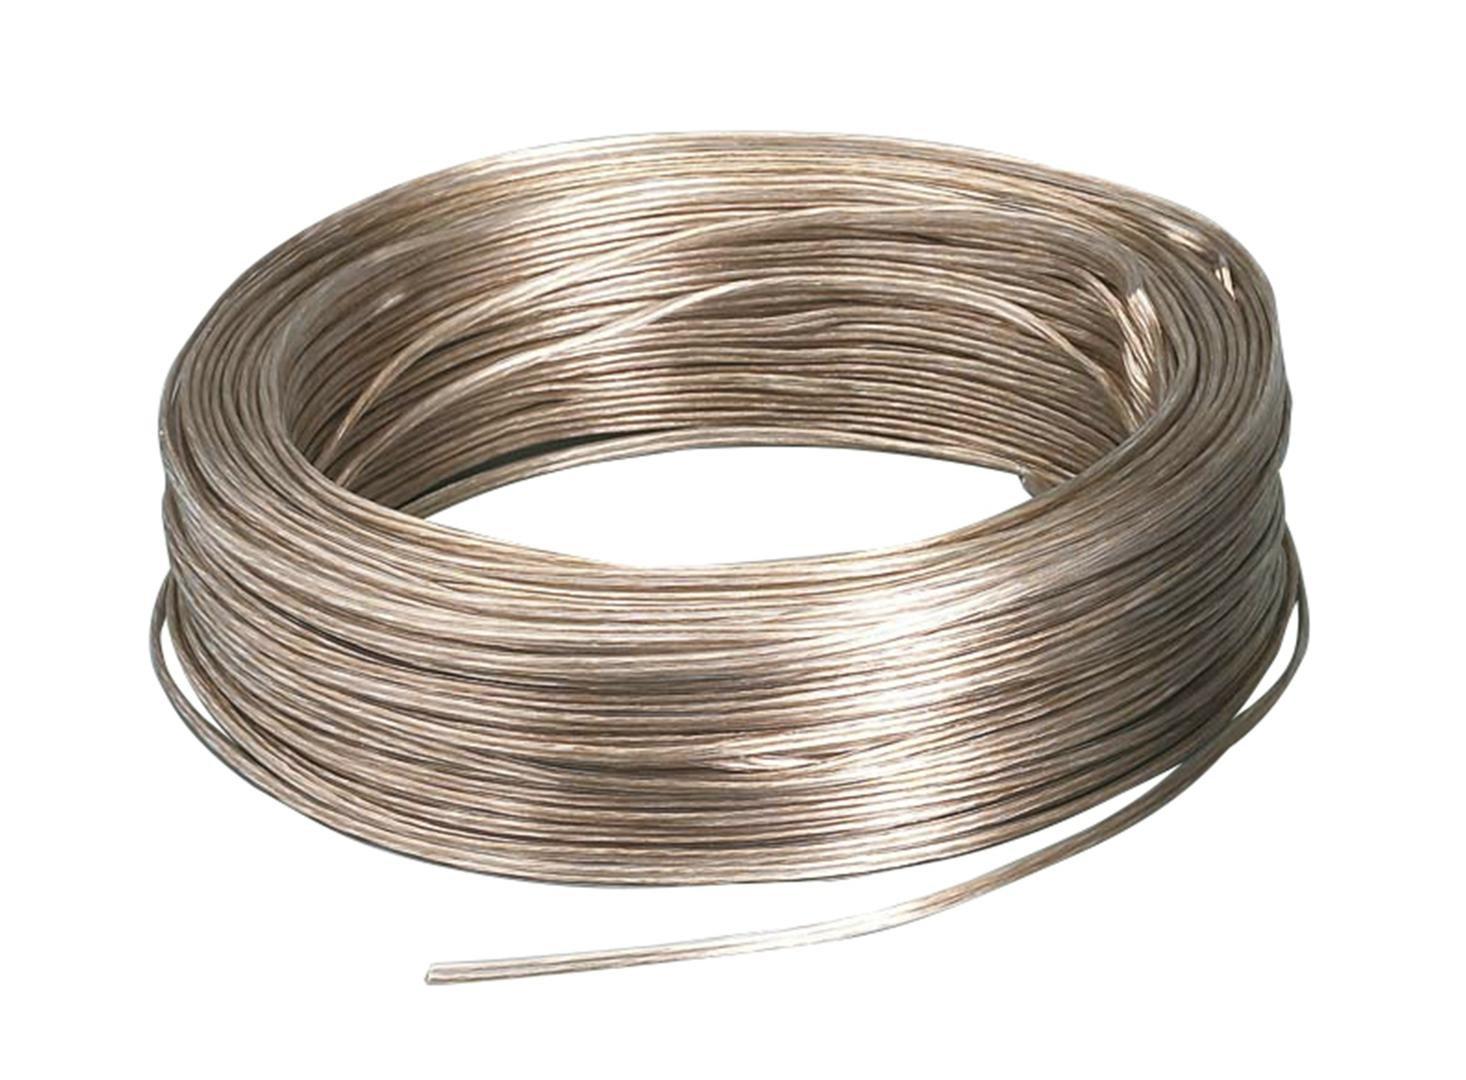 Cable Paralelo 2 X 0,50 Transparente 10 MTS